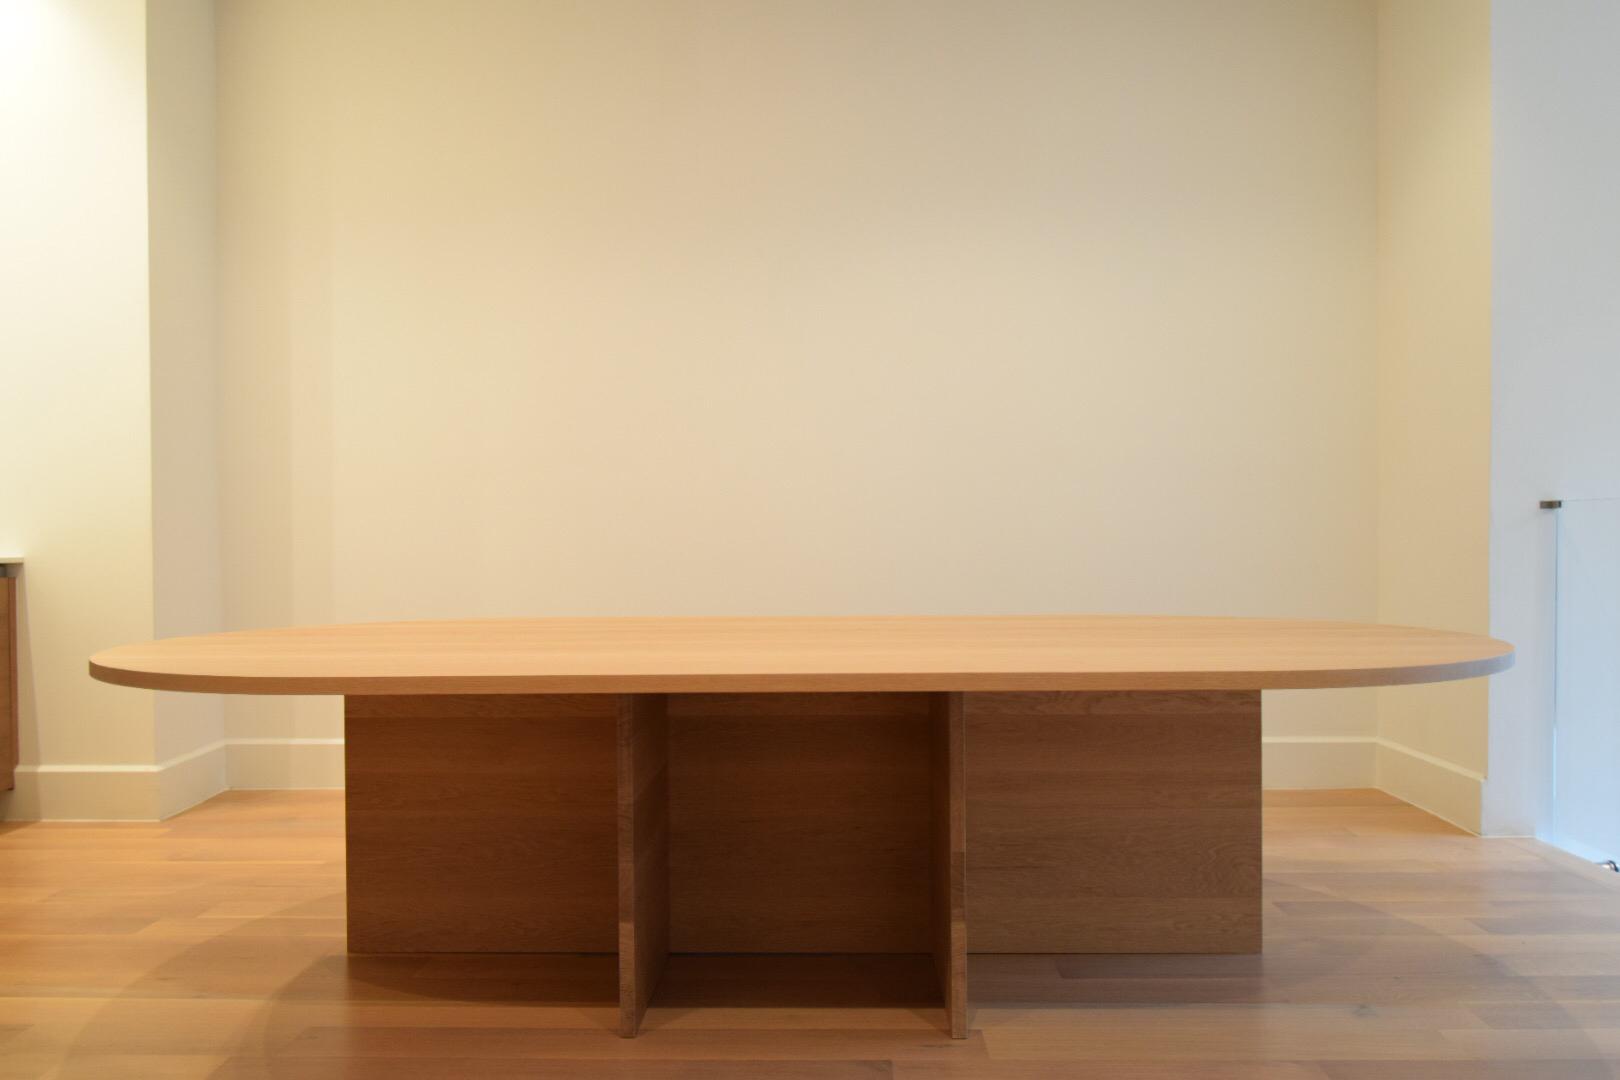 custom-solid-white-oak-table-with-natural-oil-finish-10-feet-X-5-feet.jpg